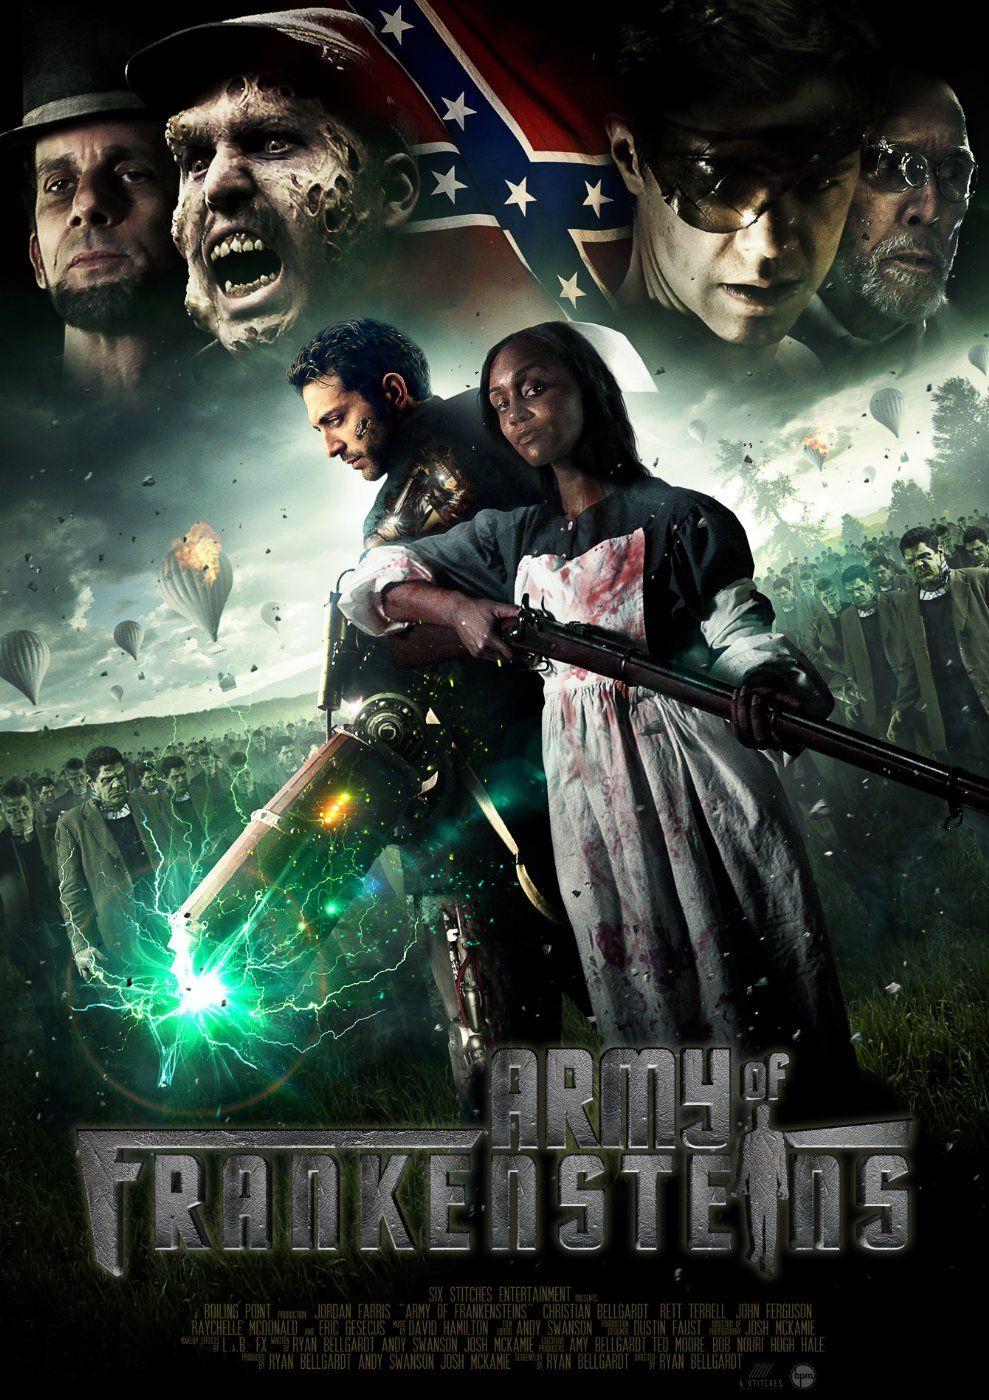 Army of Frankensteins (2013) Movie Review Horror movie